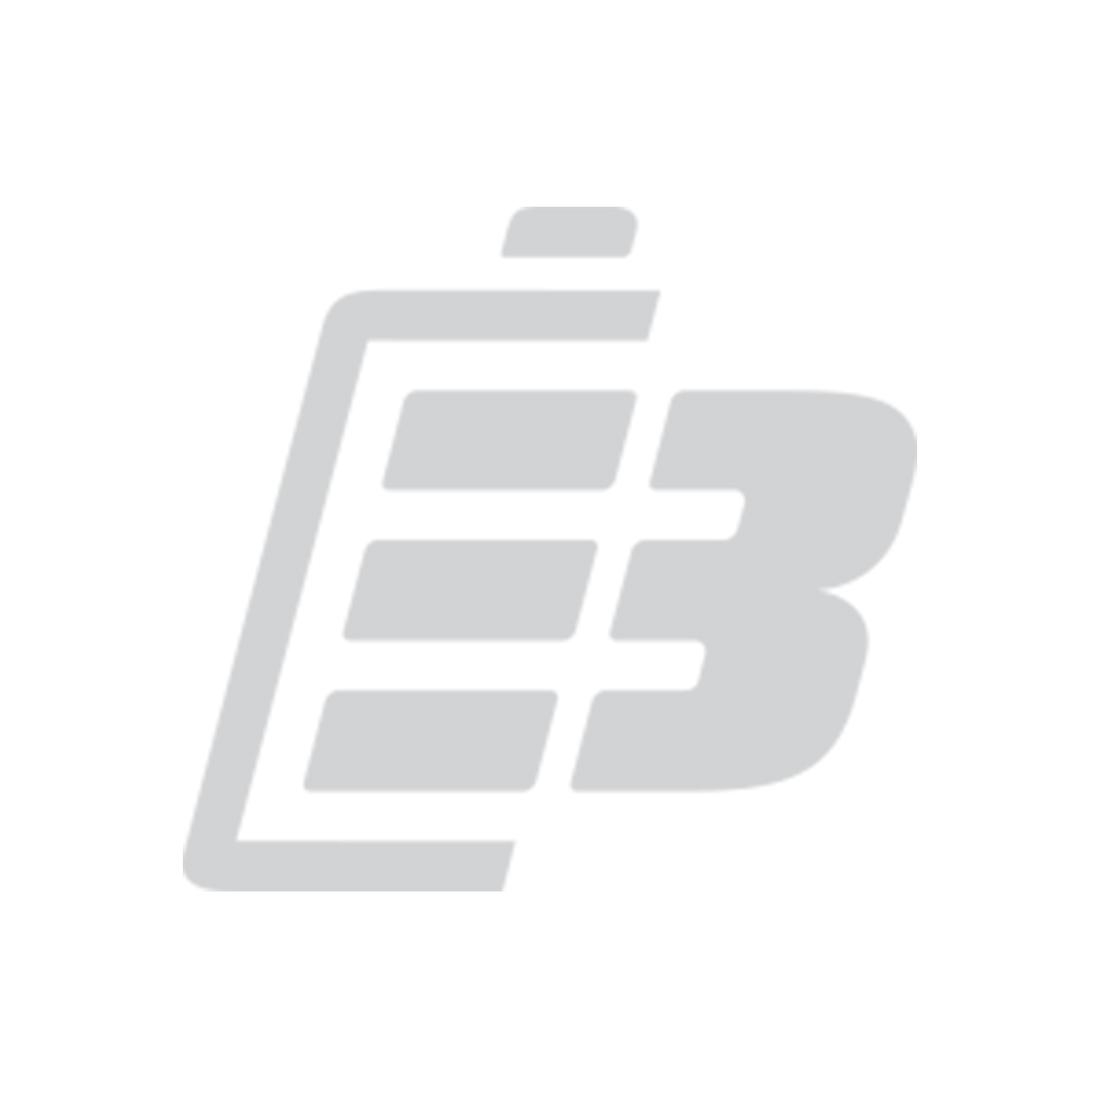 Laptop battery Lenovo ThinkPad X1 Carbon_1